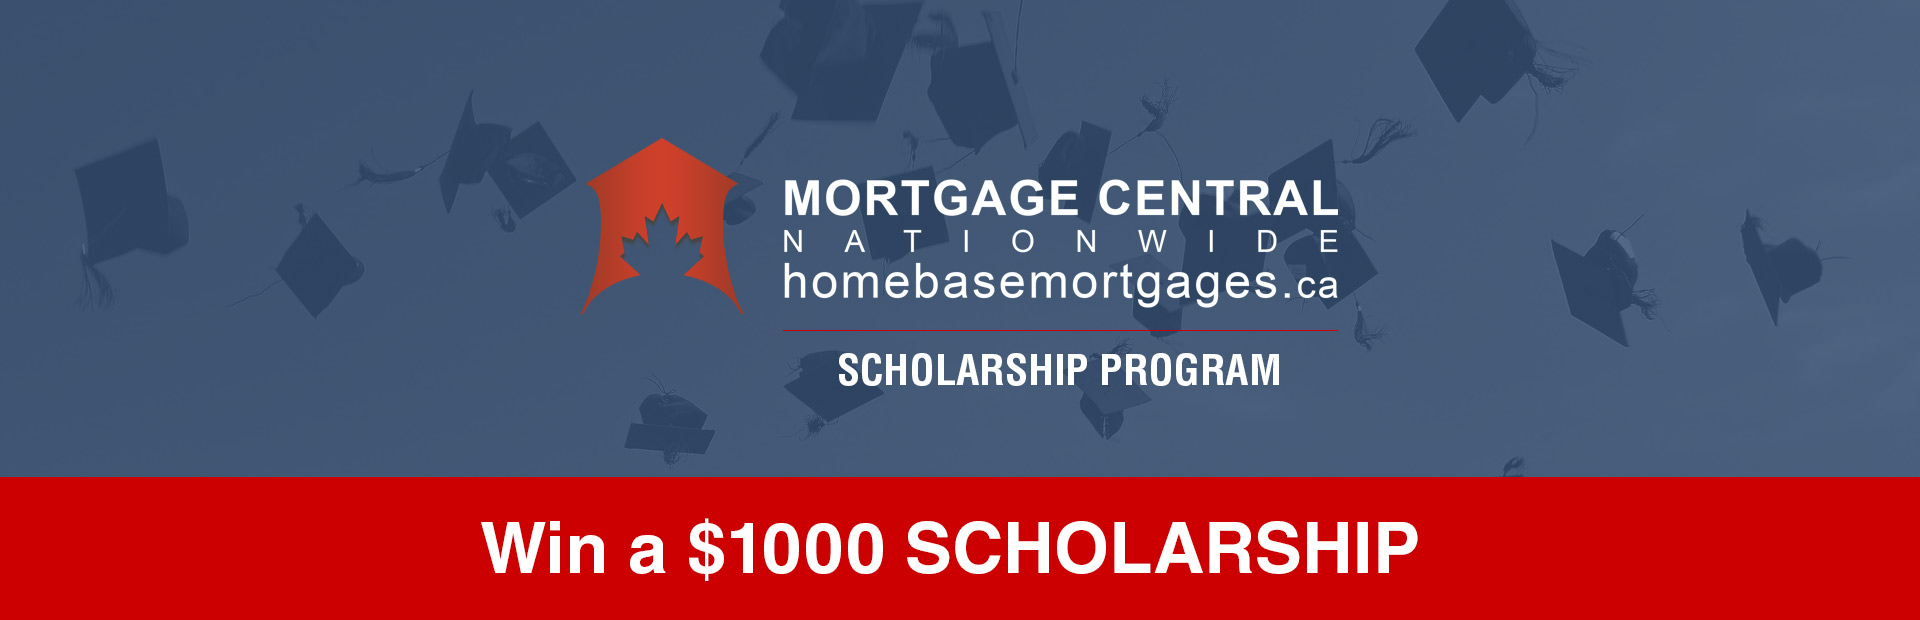 Homebase-Mortgages---Scholarship-Program